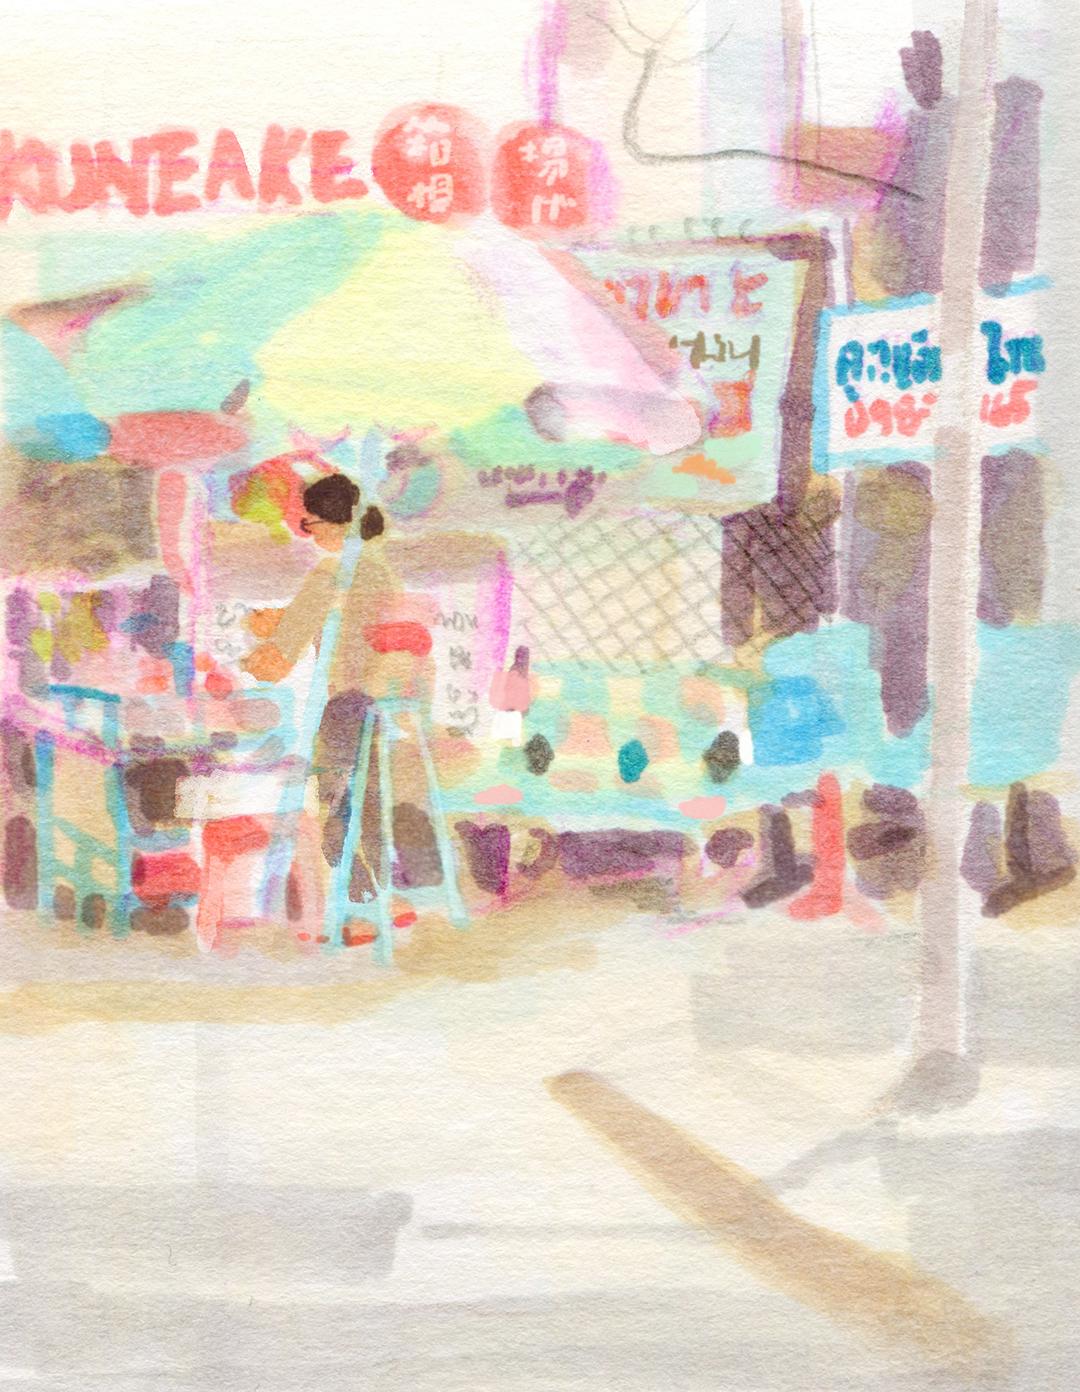 GirlsclubAsia-Artist-Yoojin Ahn-07